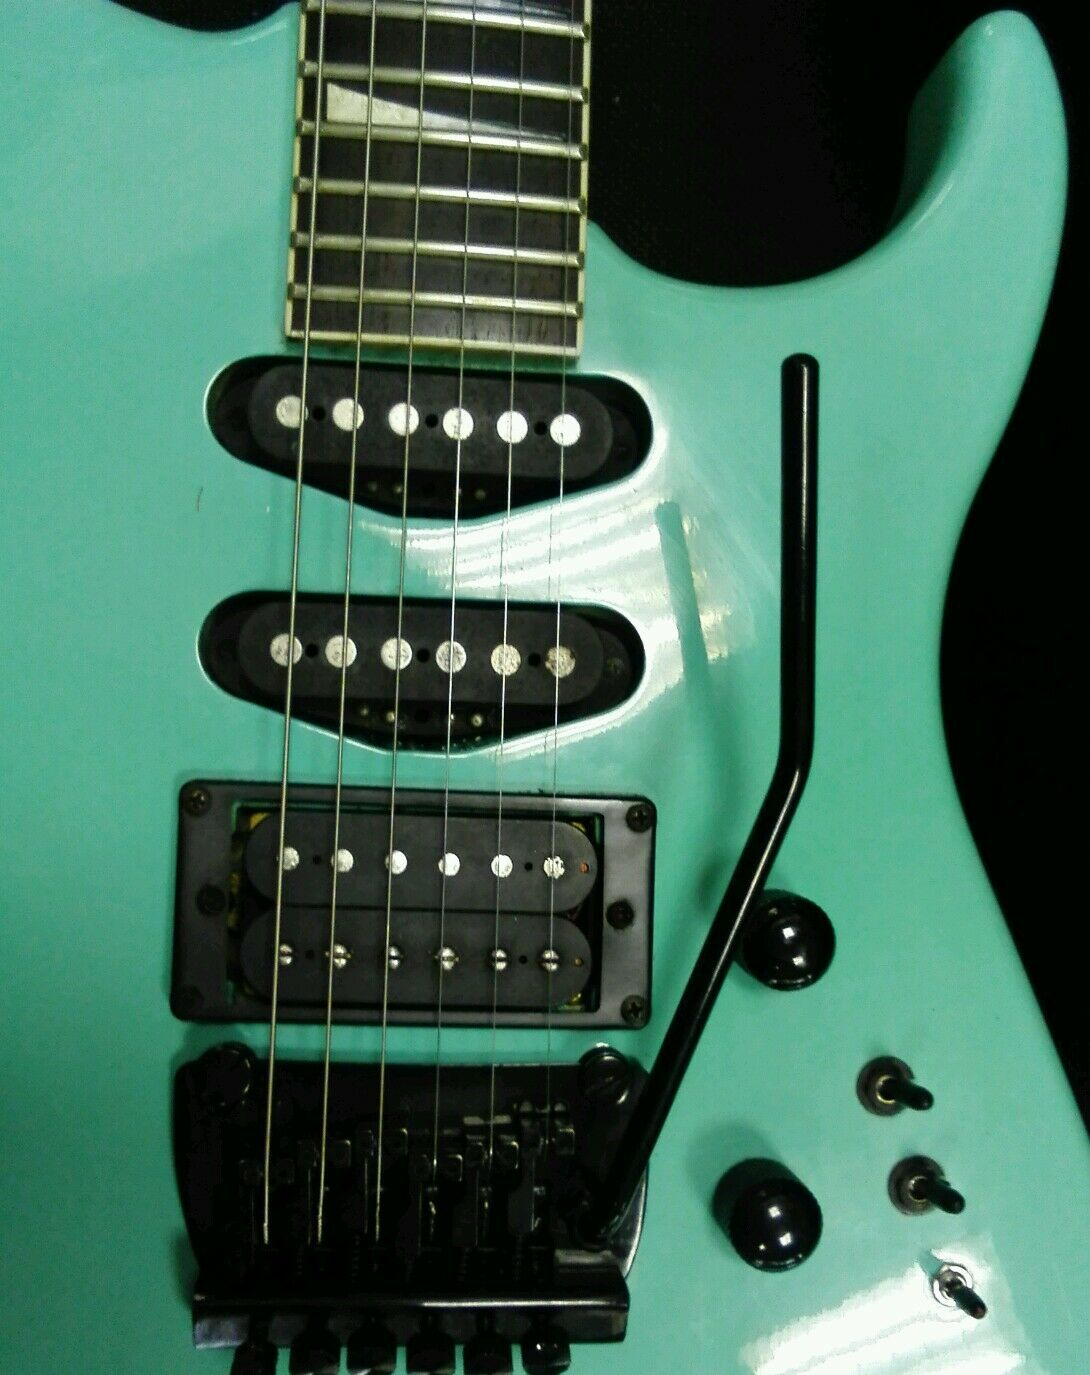 di moda Fenix Power Strat made in in in Korea 1991 Fender codice Jackson Style Floyd rosa LCD.  sconto online di vendita